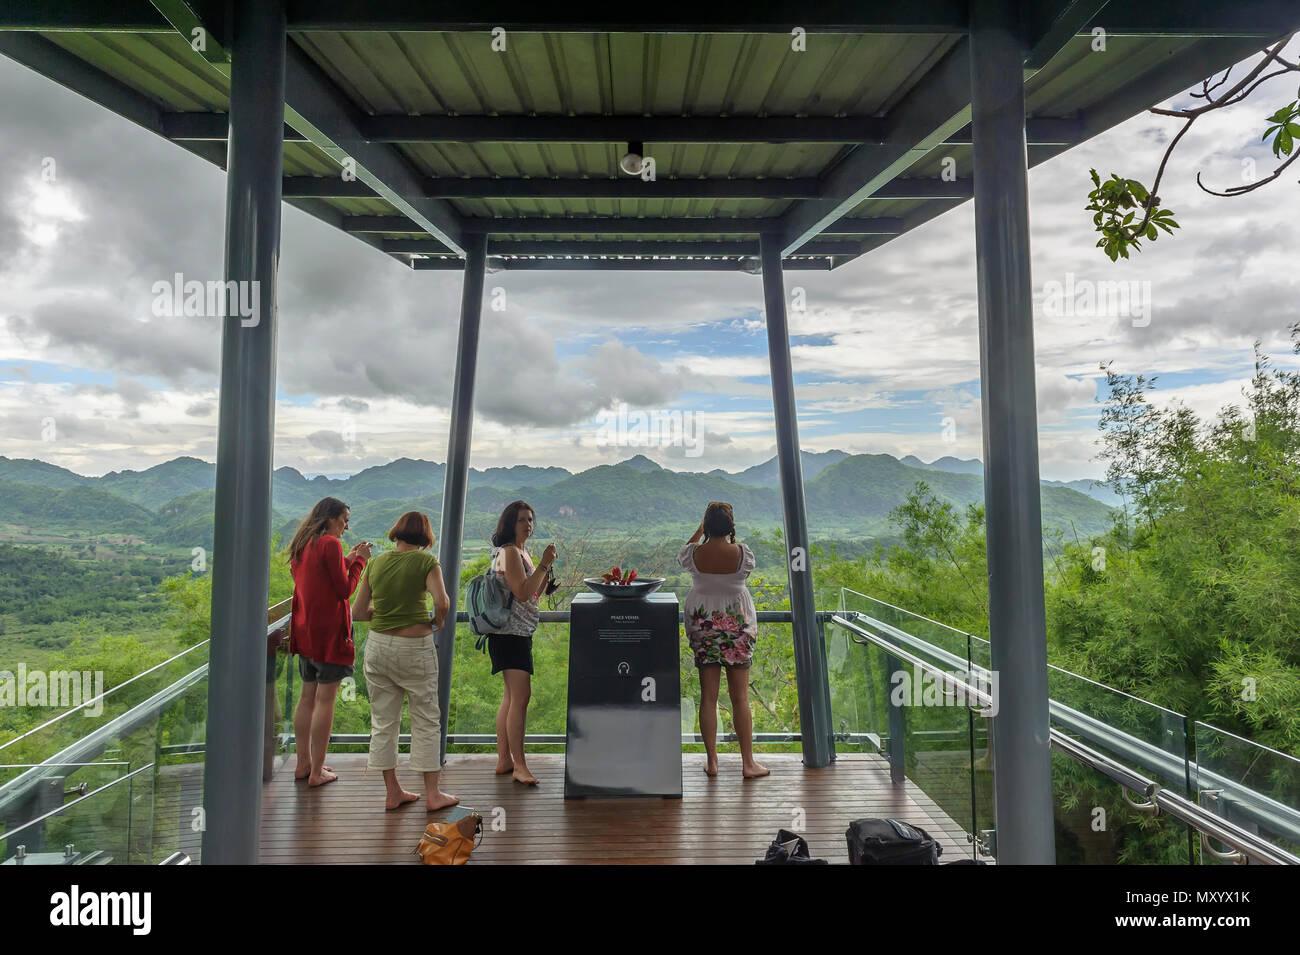 Hellfire Pass Memorial Museum, la Provincia di Kanchanaburi, Thailandia Immagini Stock